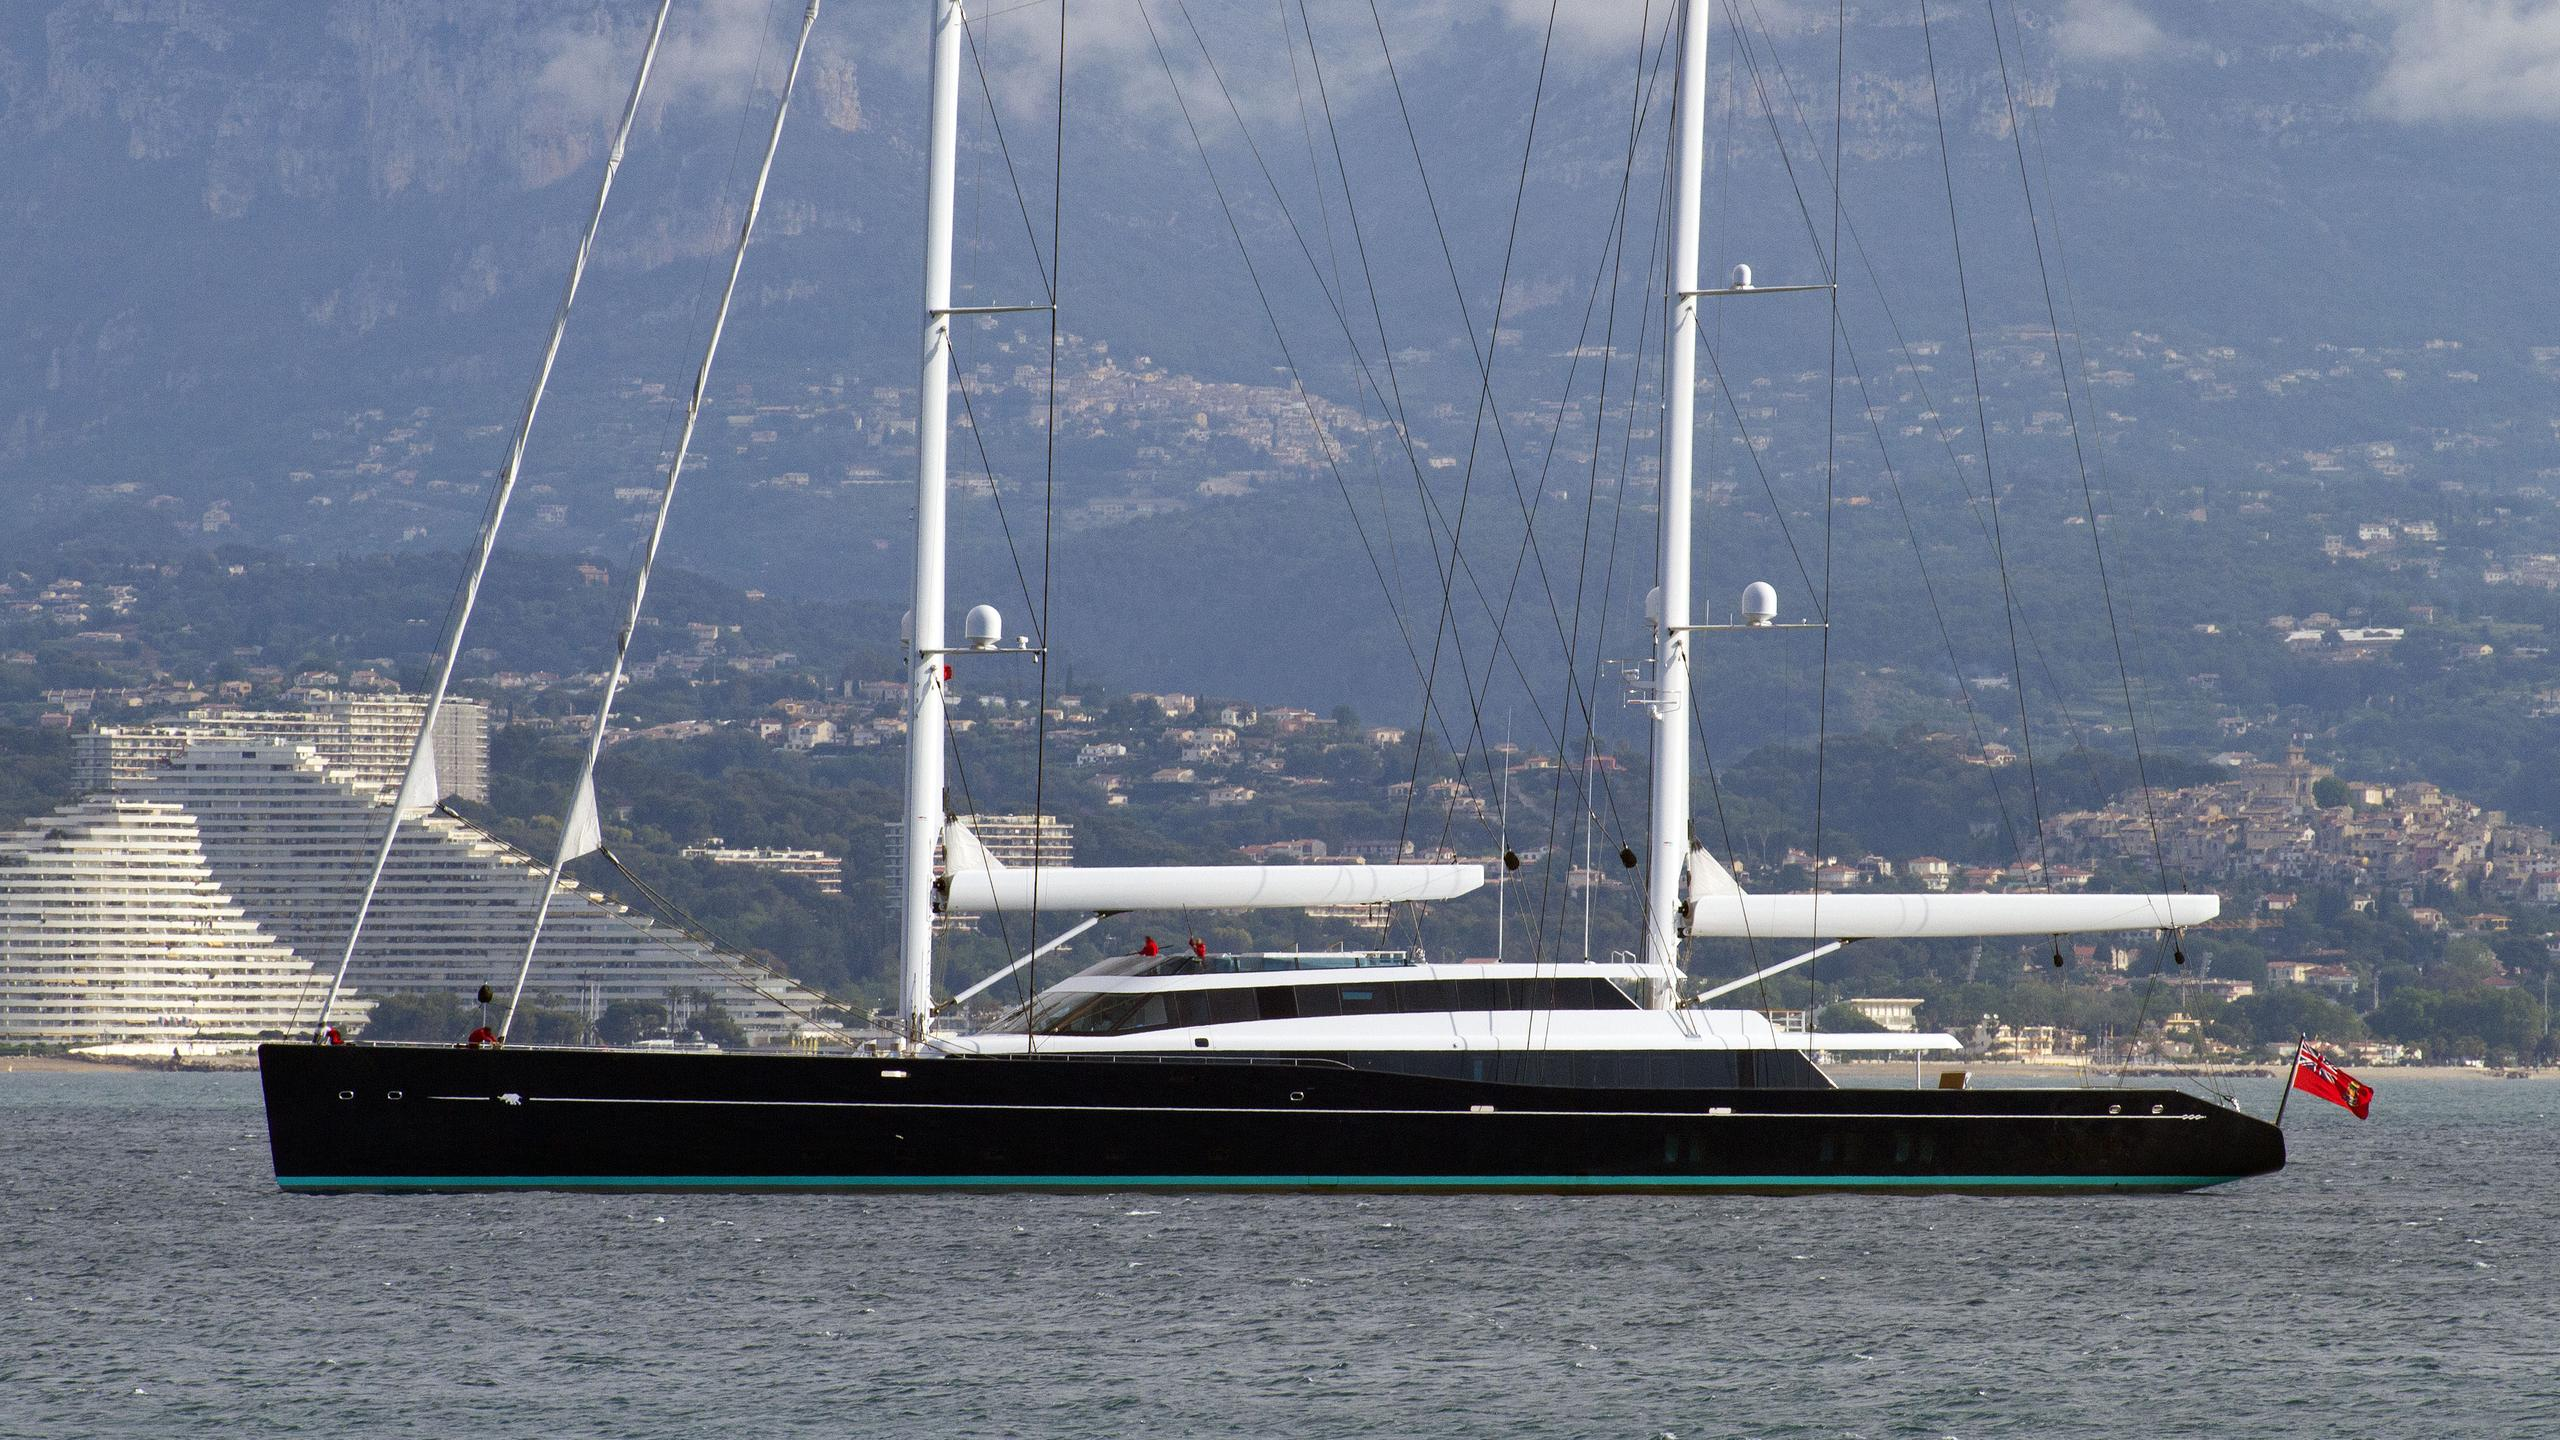 aquijo-sailing-yacht-vitters-oceanco-2015-86m-profile